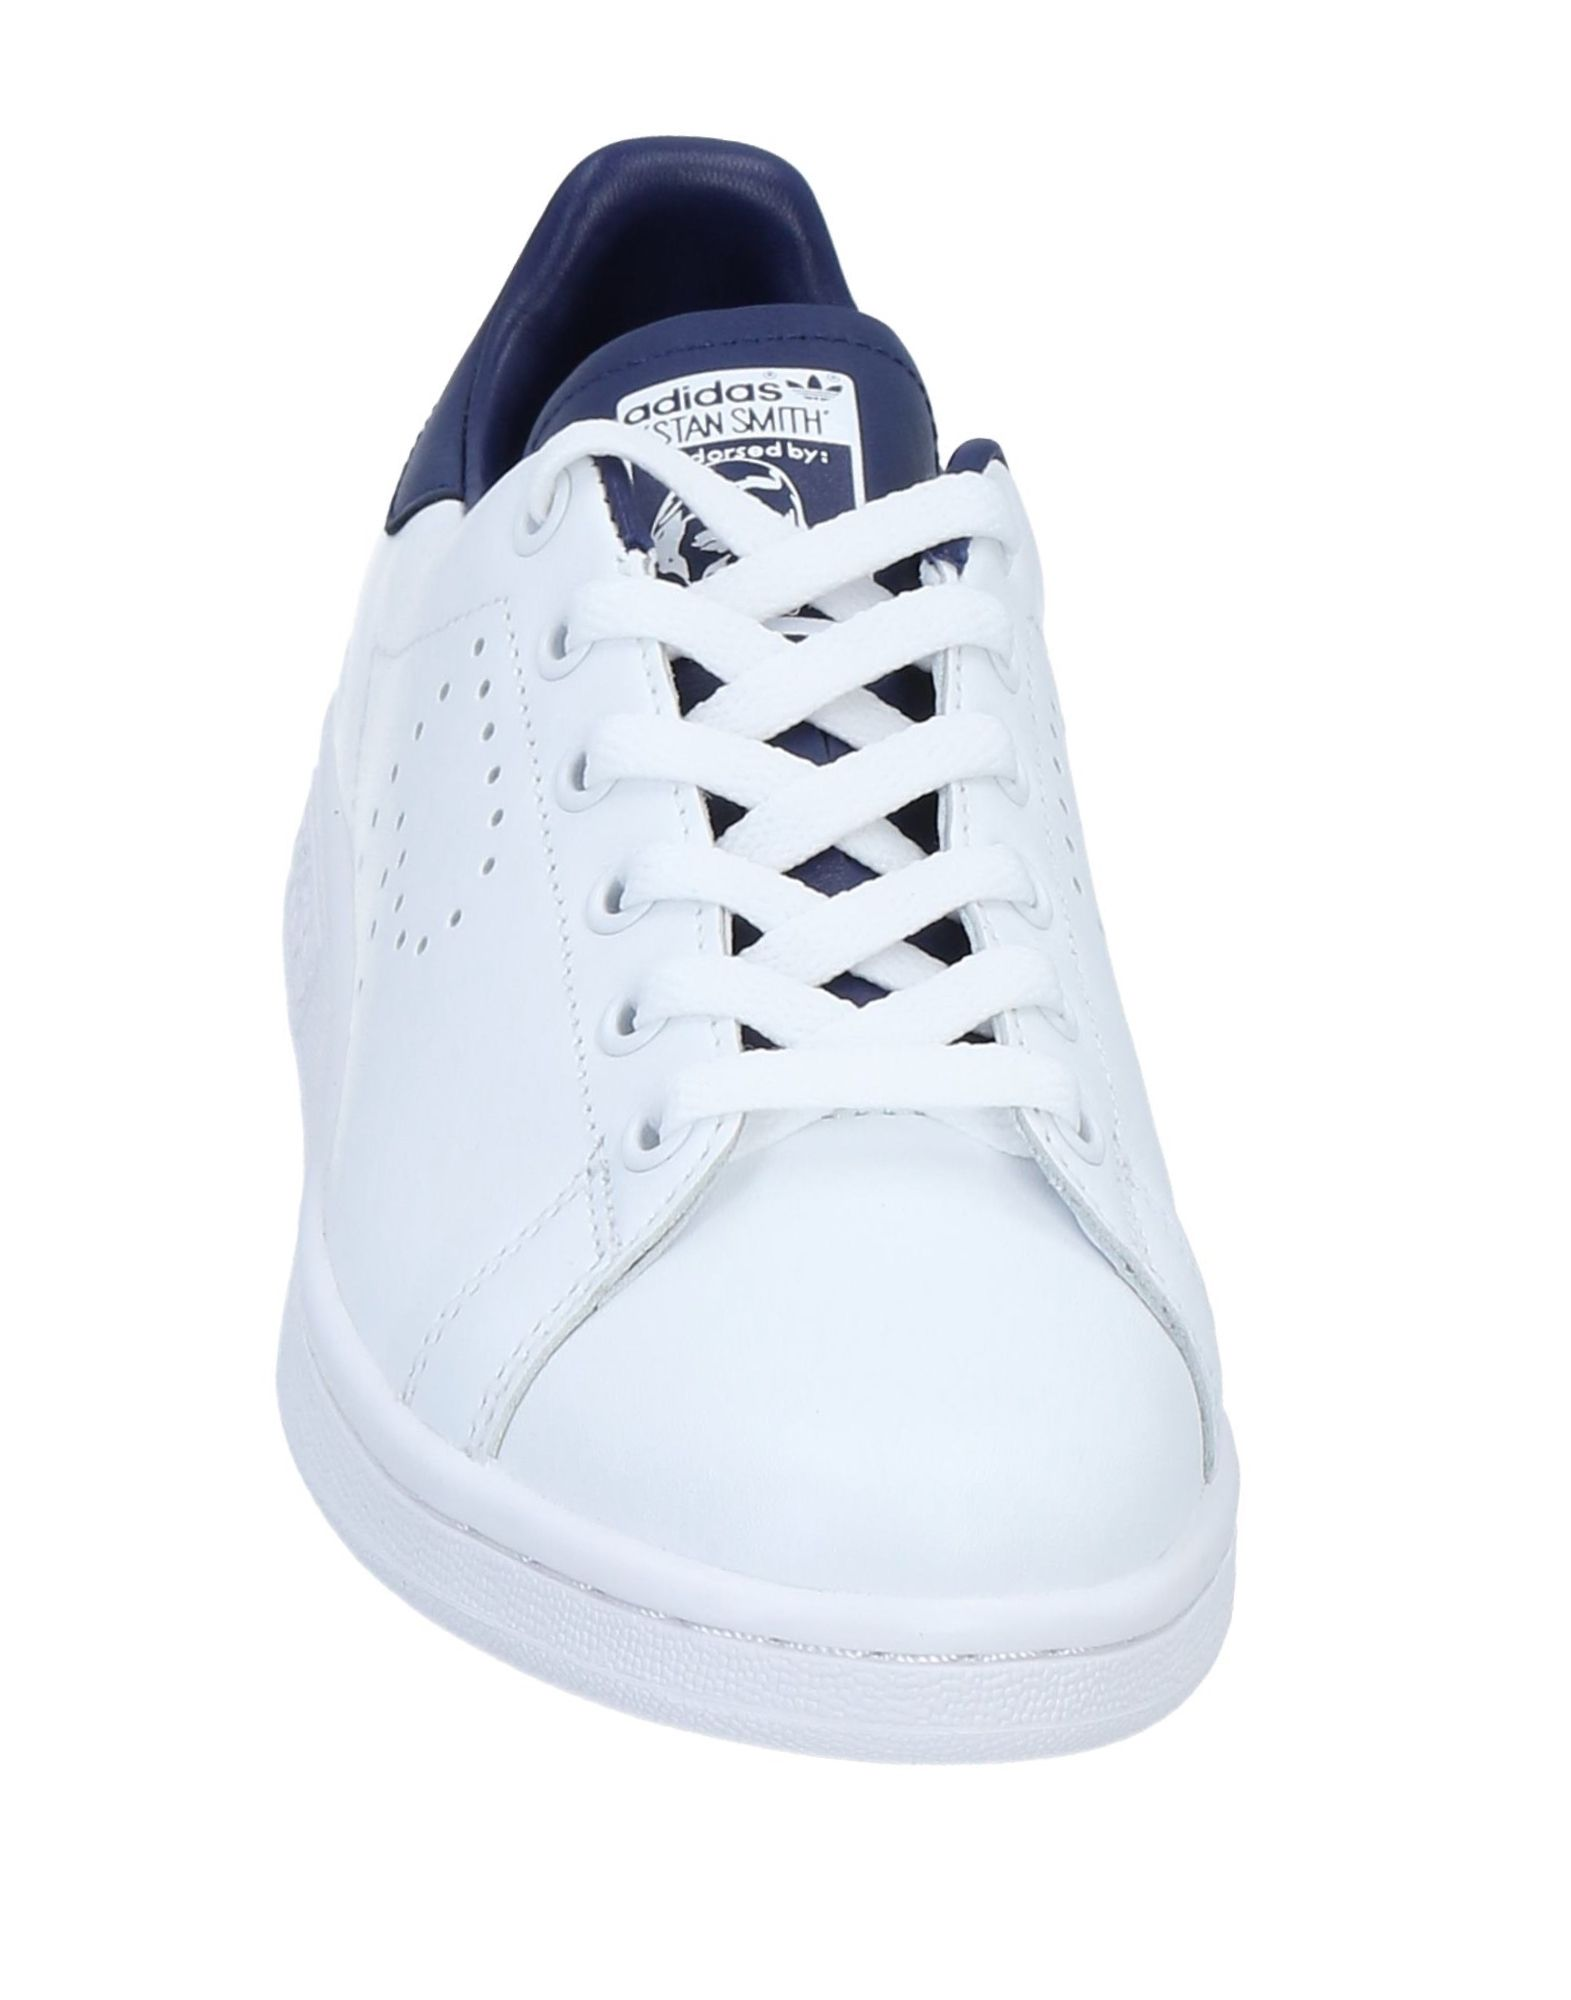 Adidas By  Raf Simons Sneakers Herren  By 11540760HU Gute Qualität beliebte Schuhe be8d33